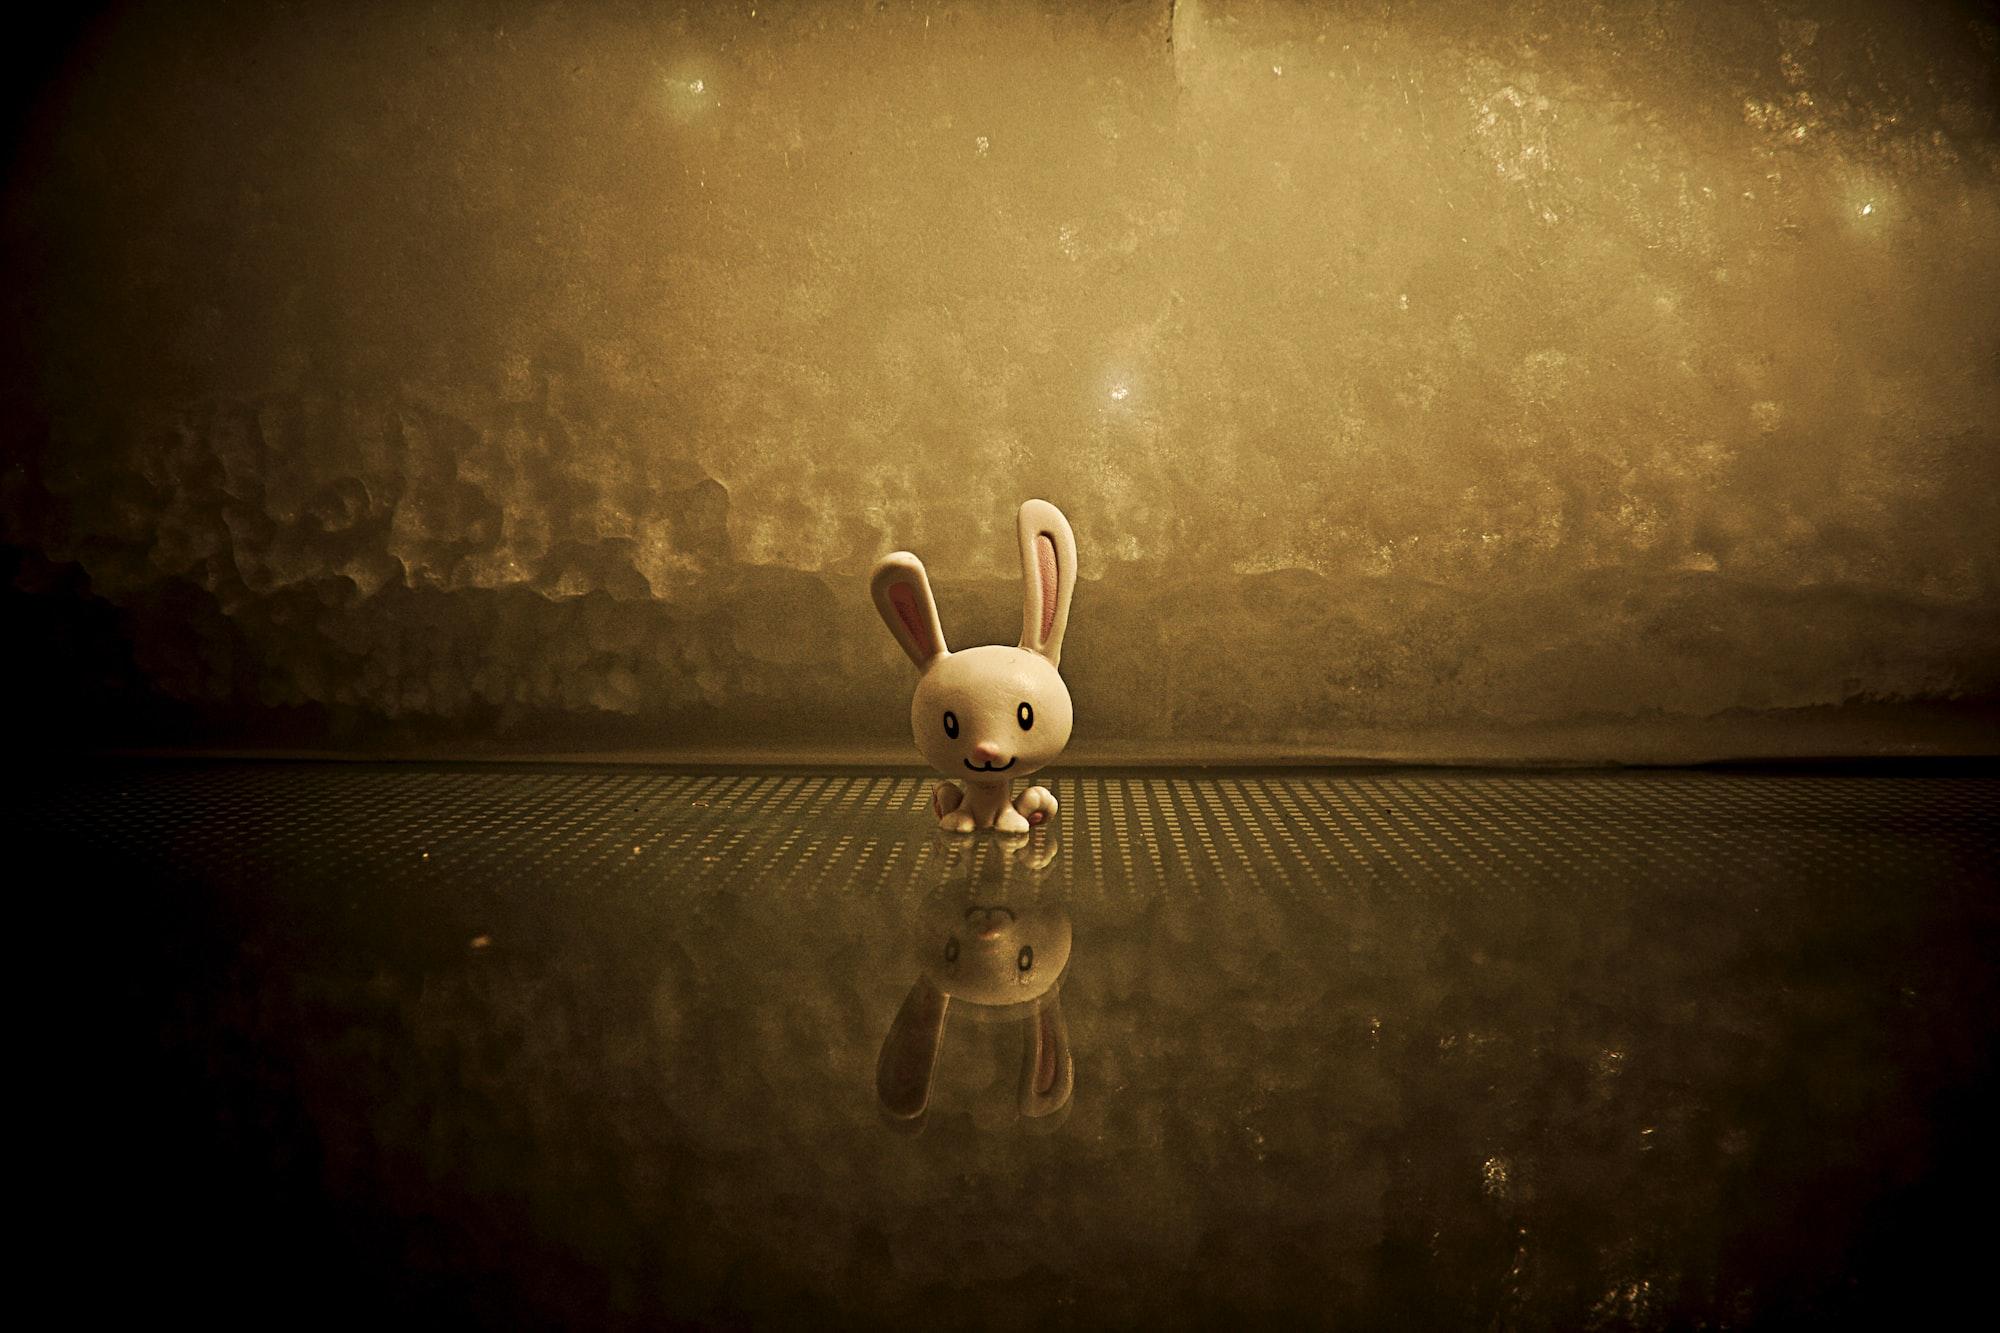 Smiling plastic bunny